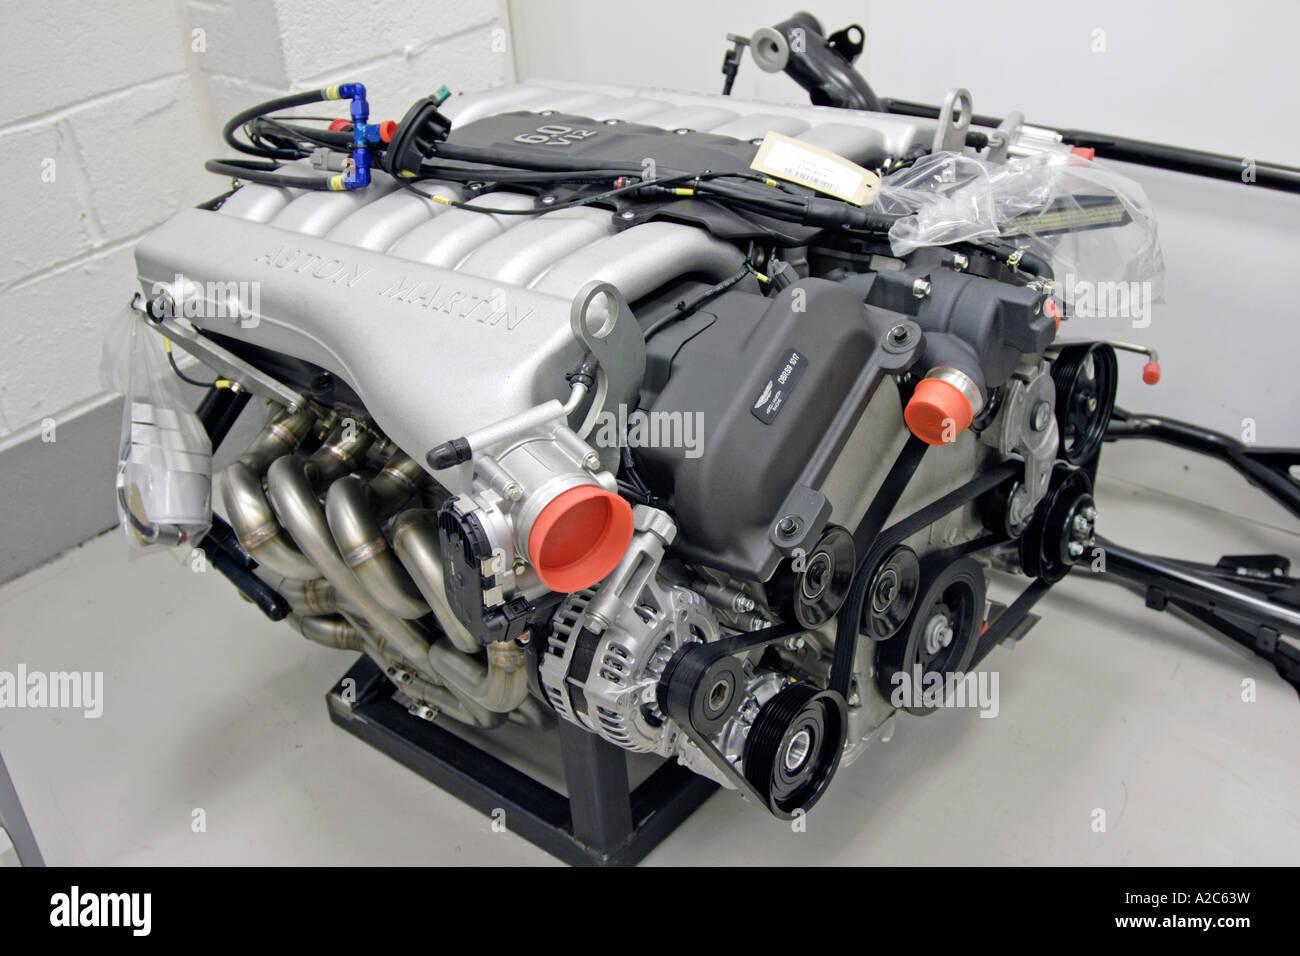 Aston Martin Racing Dbrs9 Engine In The Aston Martin Racing Workshop